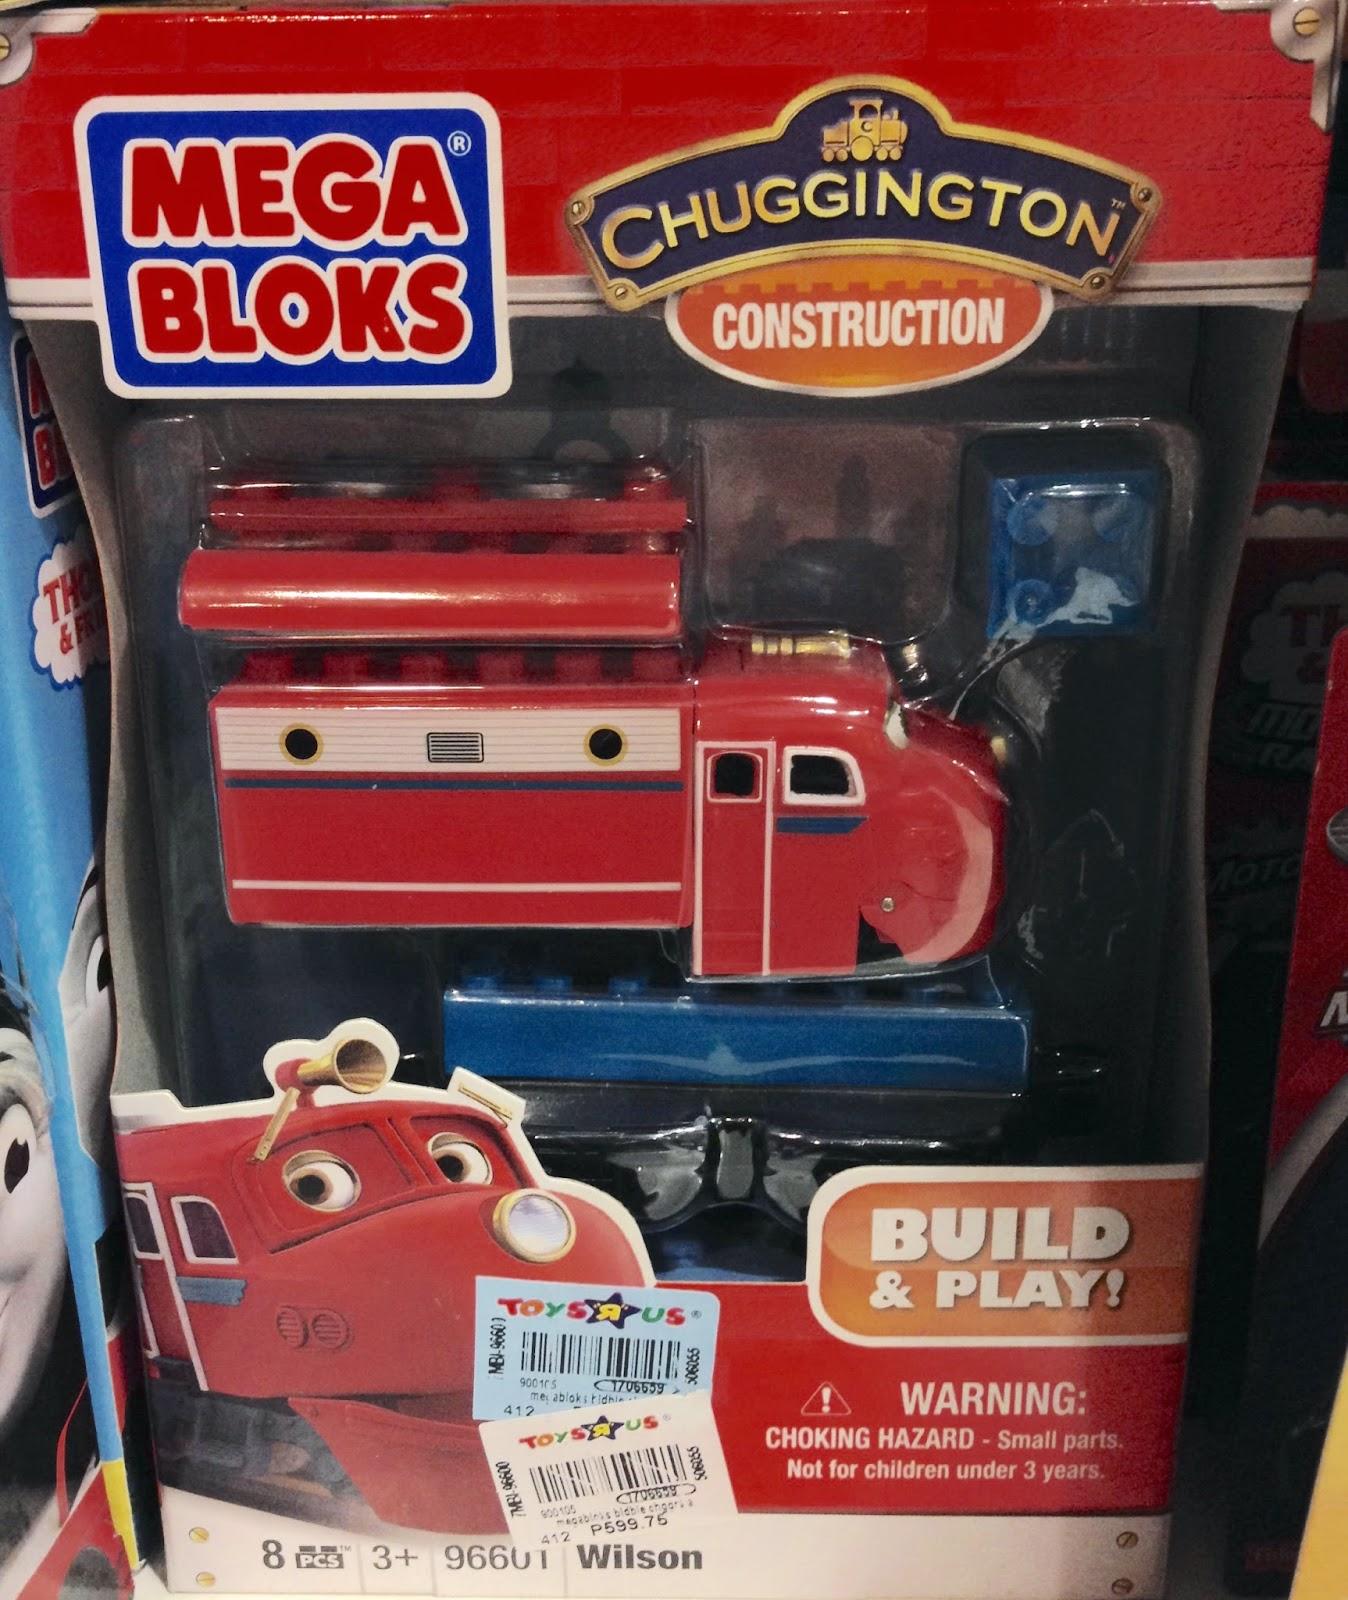 Mega Bloks Chuggington Trains Toy Sale - Wilson